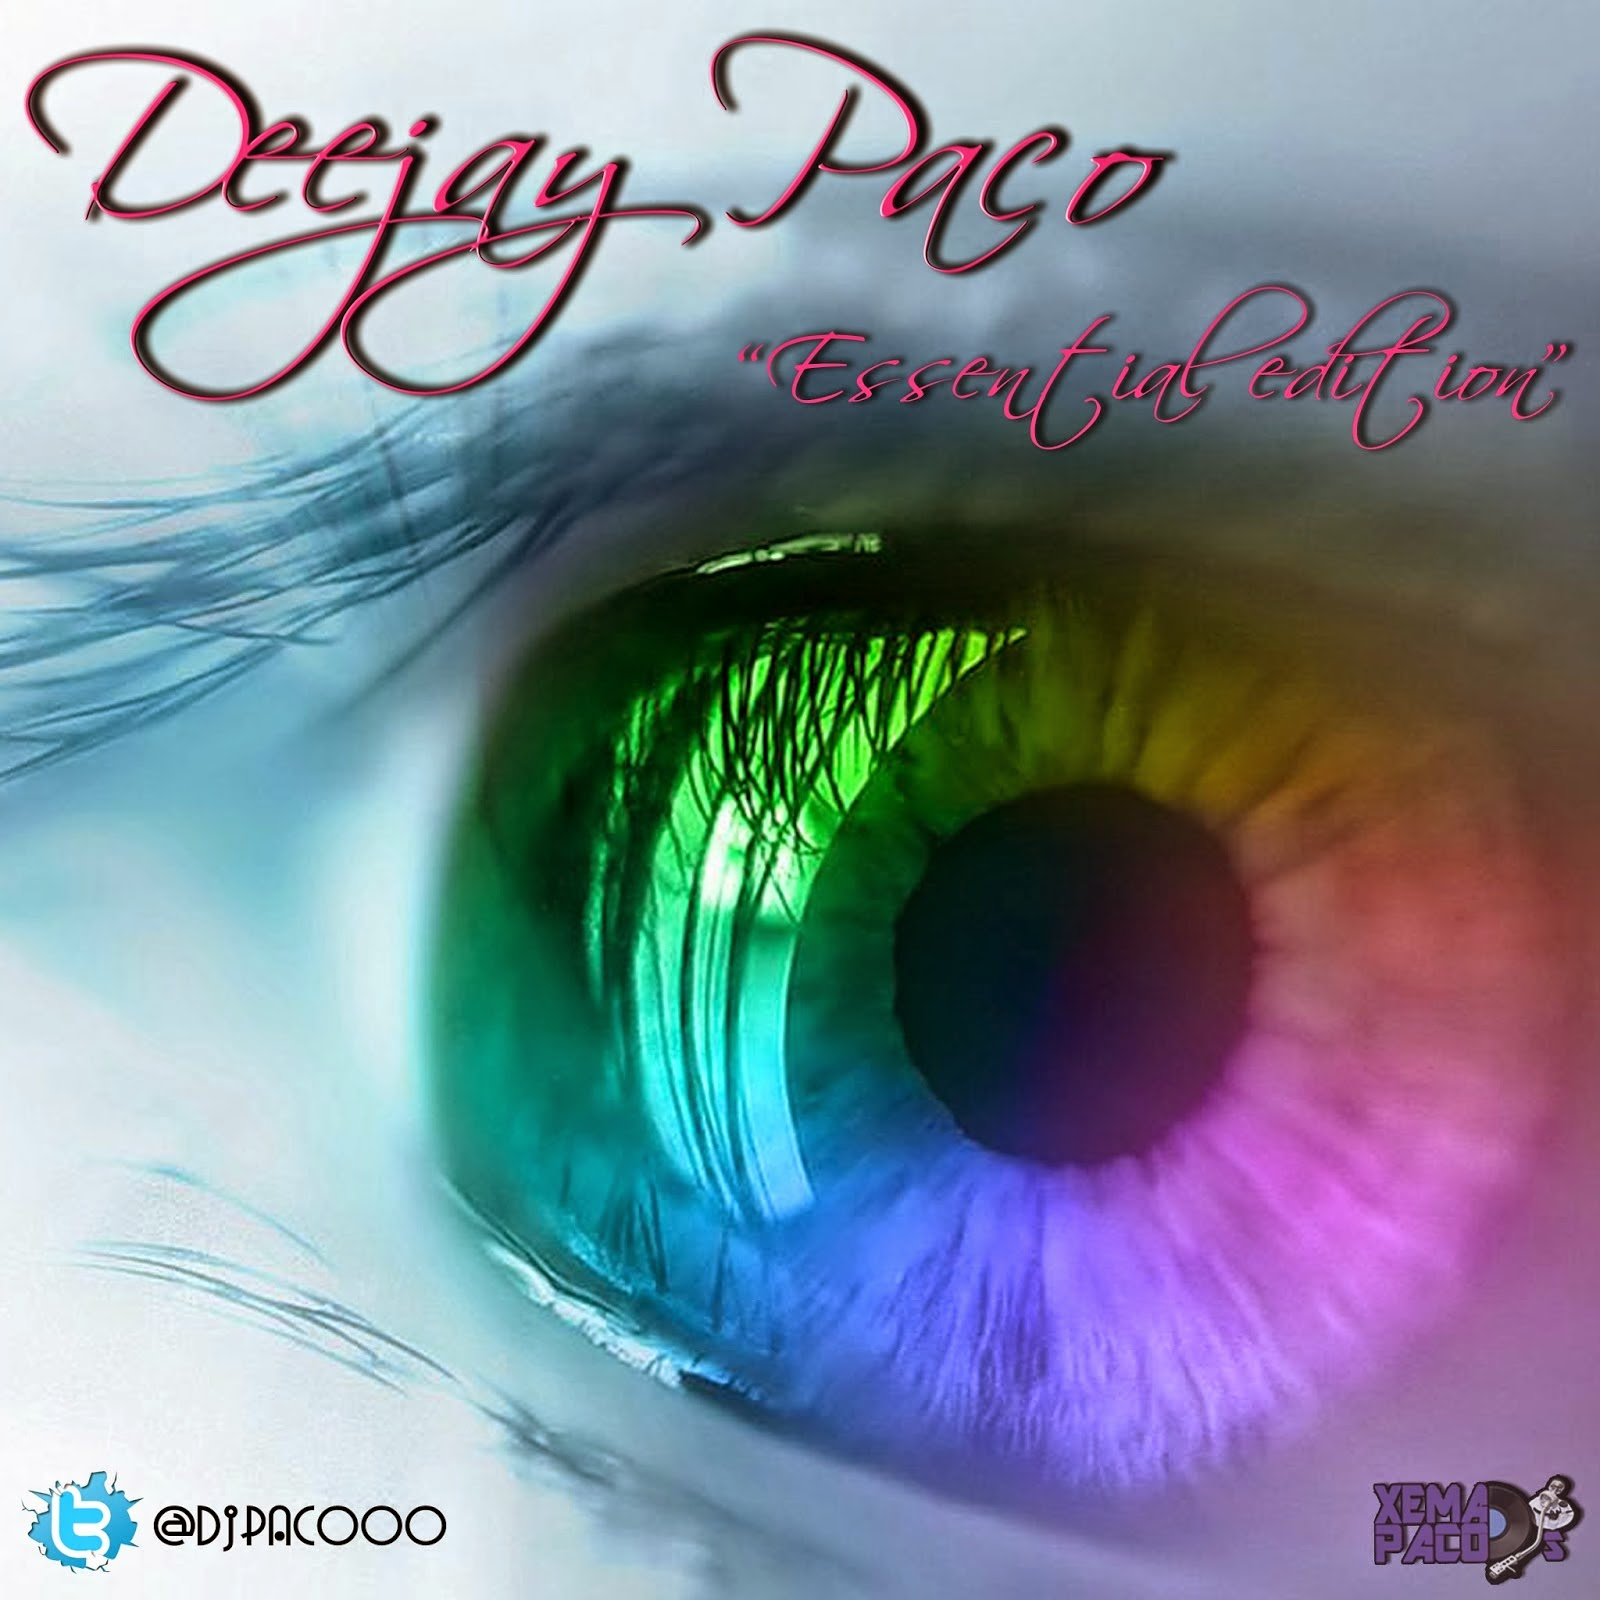 http://www.mediafire.com/download/80f1rgef6hpbuoq/Deejay+Paco+Session+Essential+Edition.rar